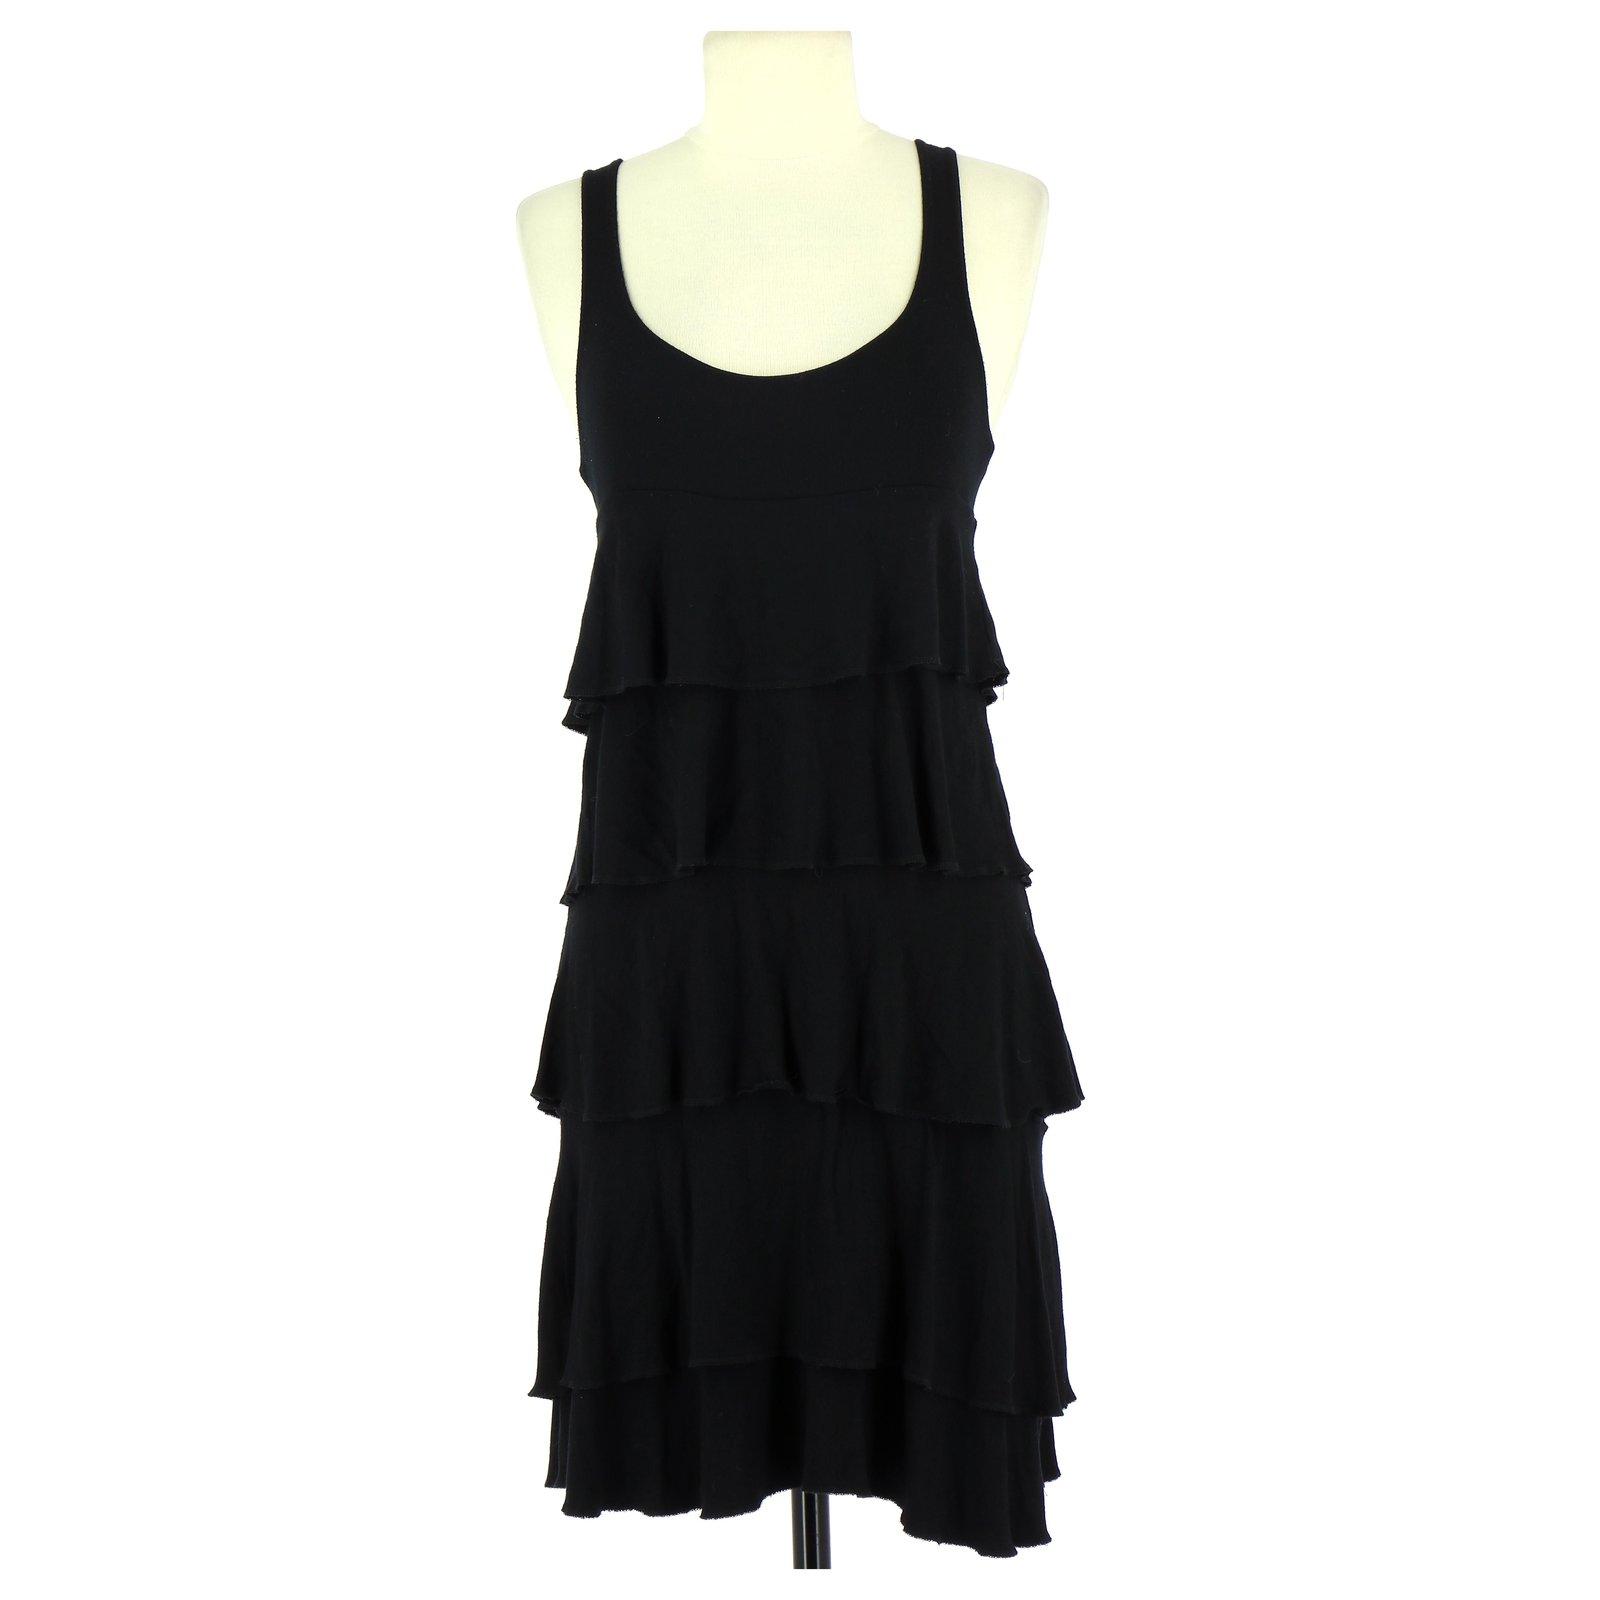 Robes Sinequanone Robe Viscose Noir Ref 112308 Joli Closet